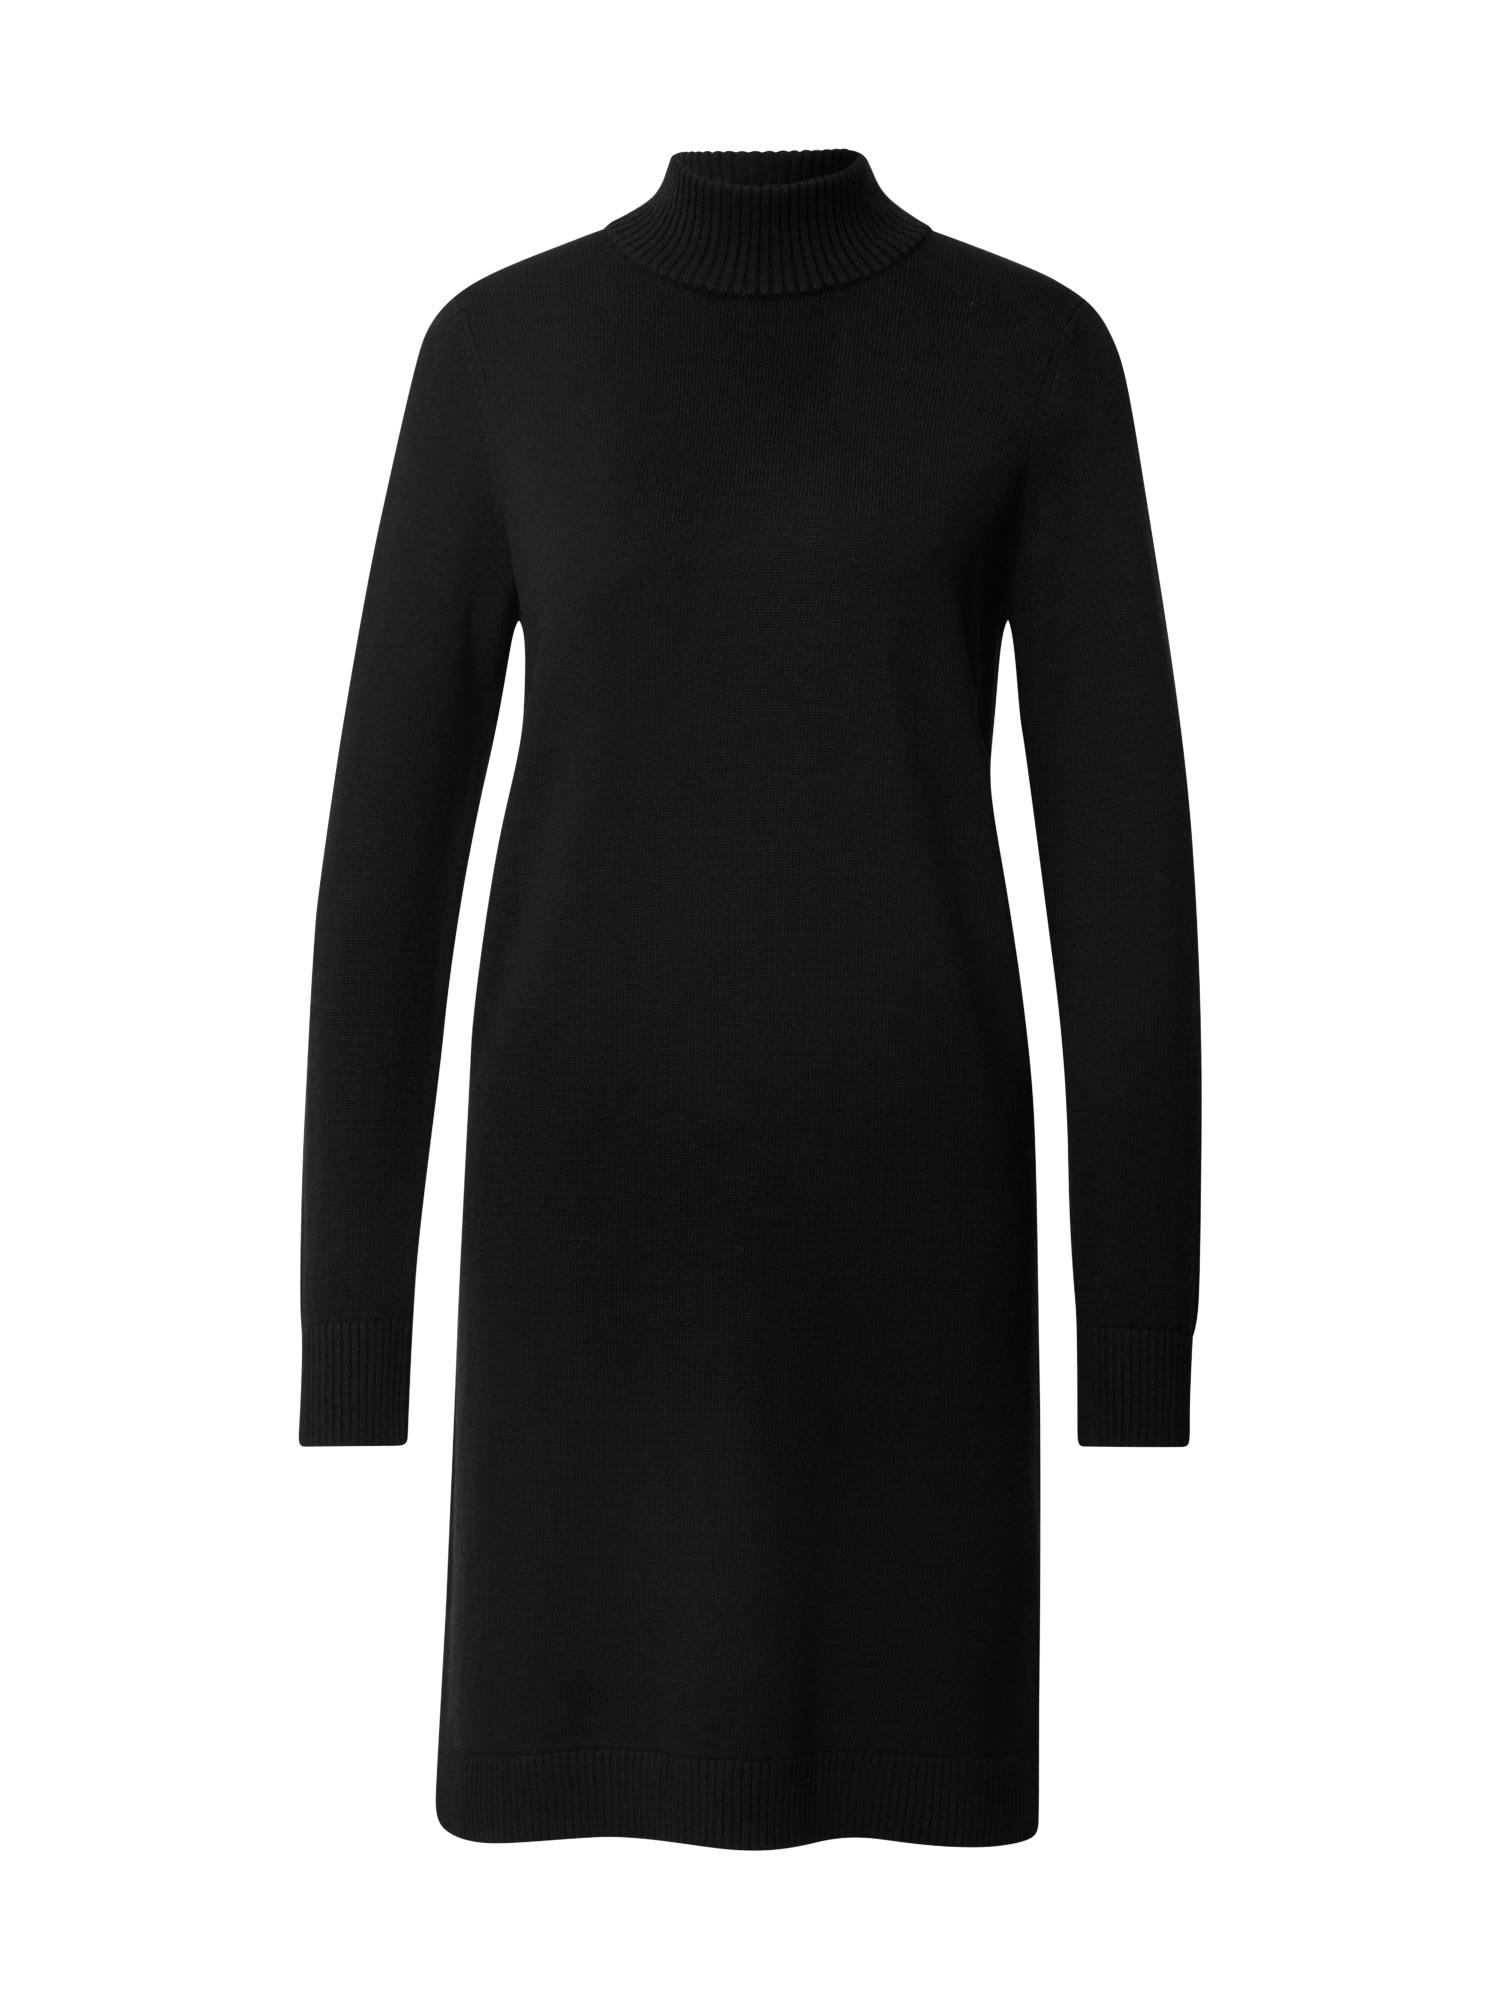 BOSS Megzta suknelė juoda